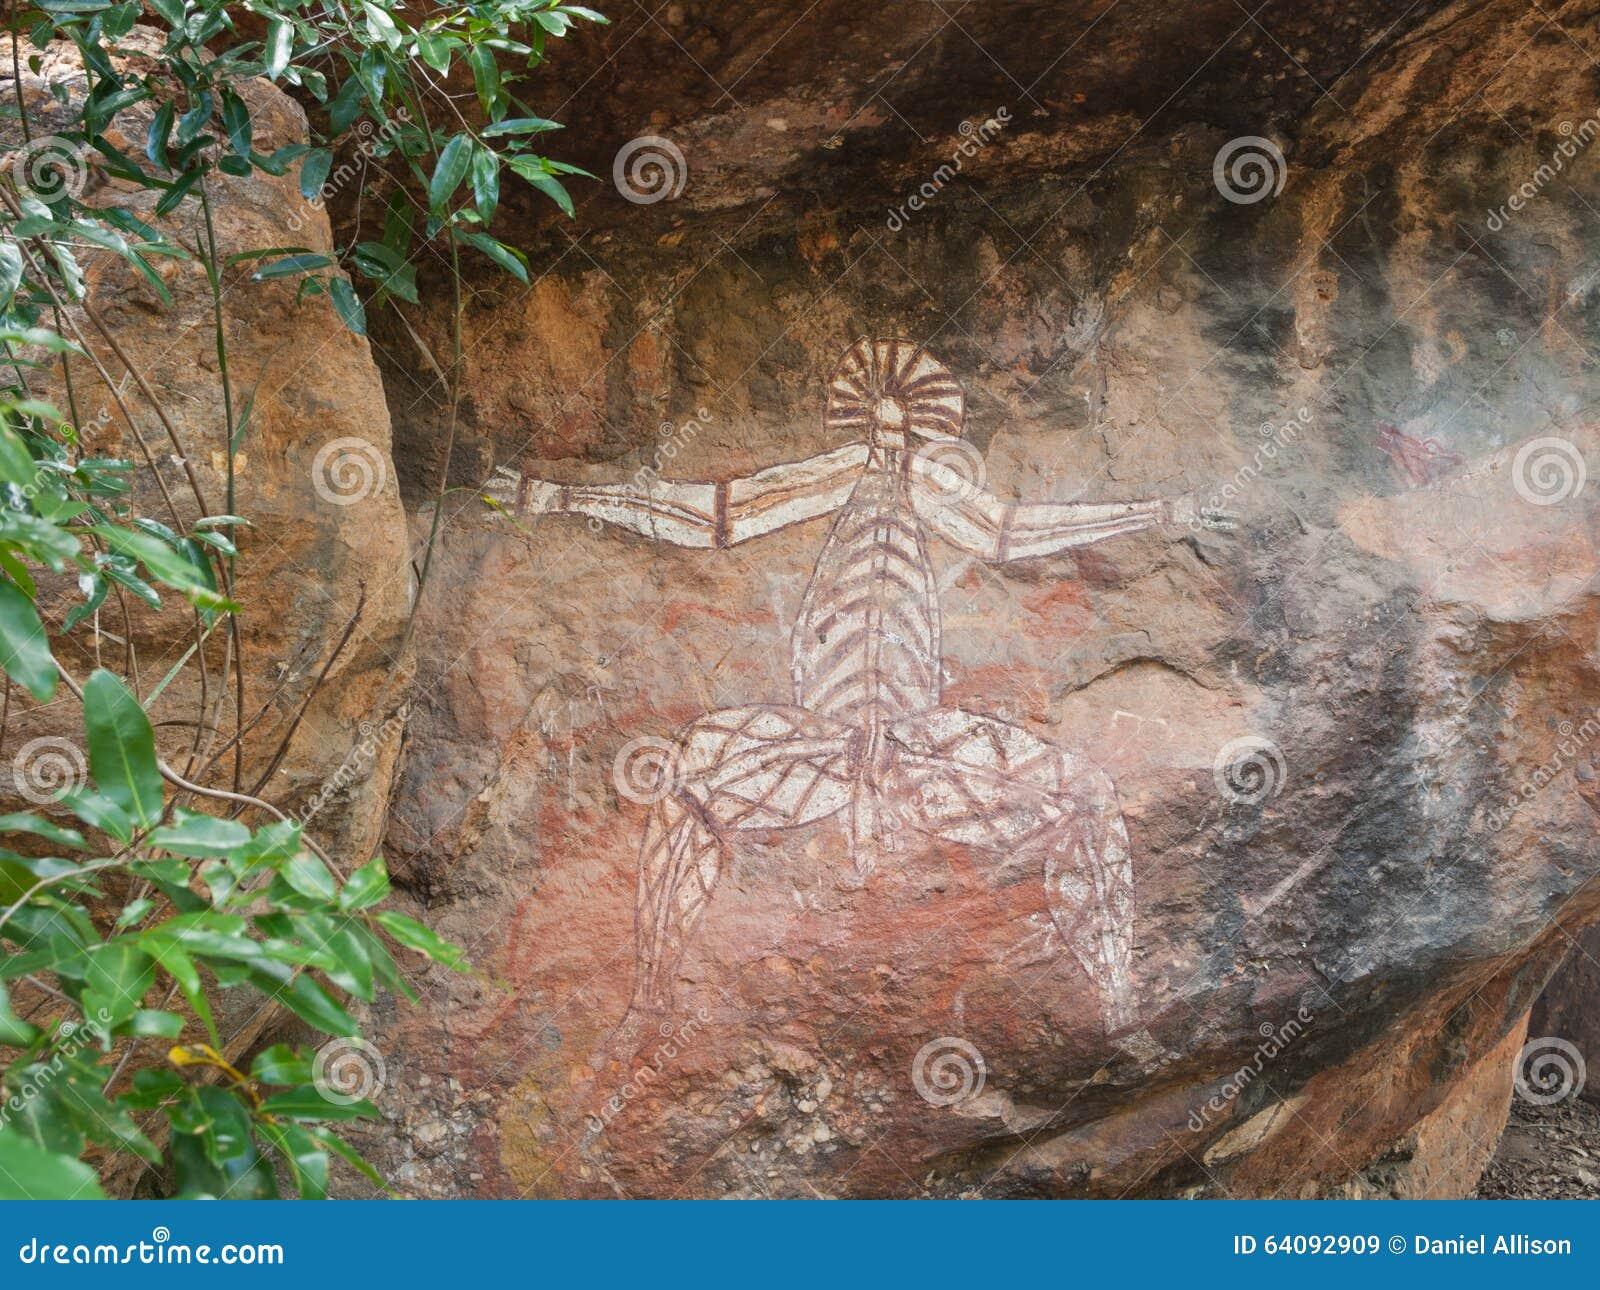 Kakadu, Australie occidentale, 06/10/2013, art indigène de roche dans Nourlangie, parc national de Kakadu, territoires du nord, A